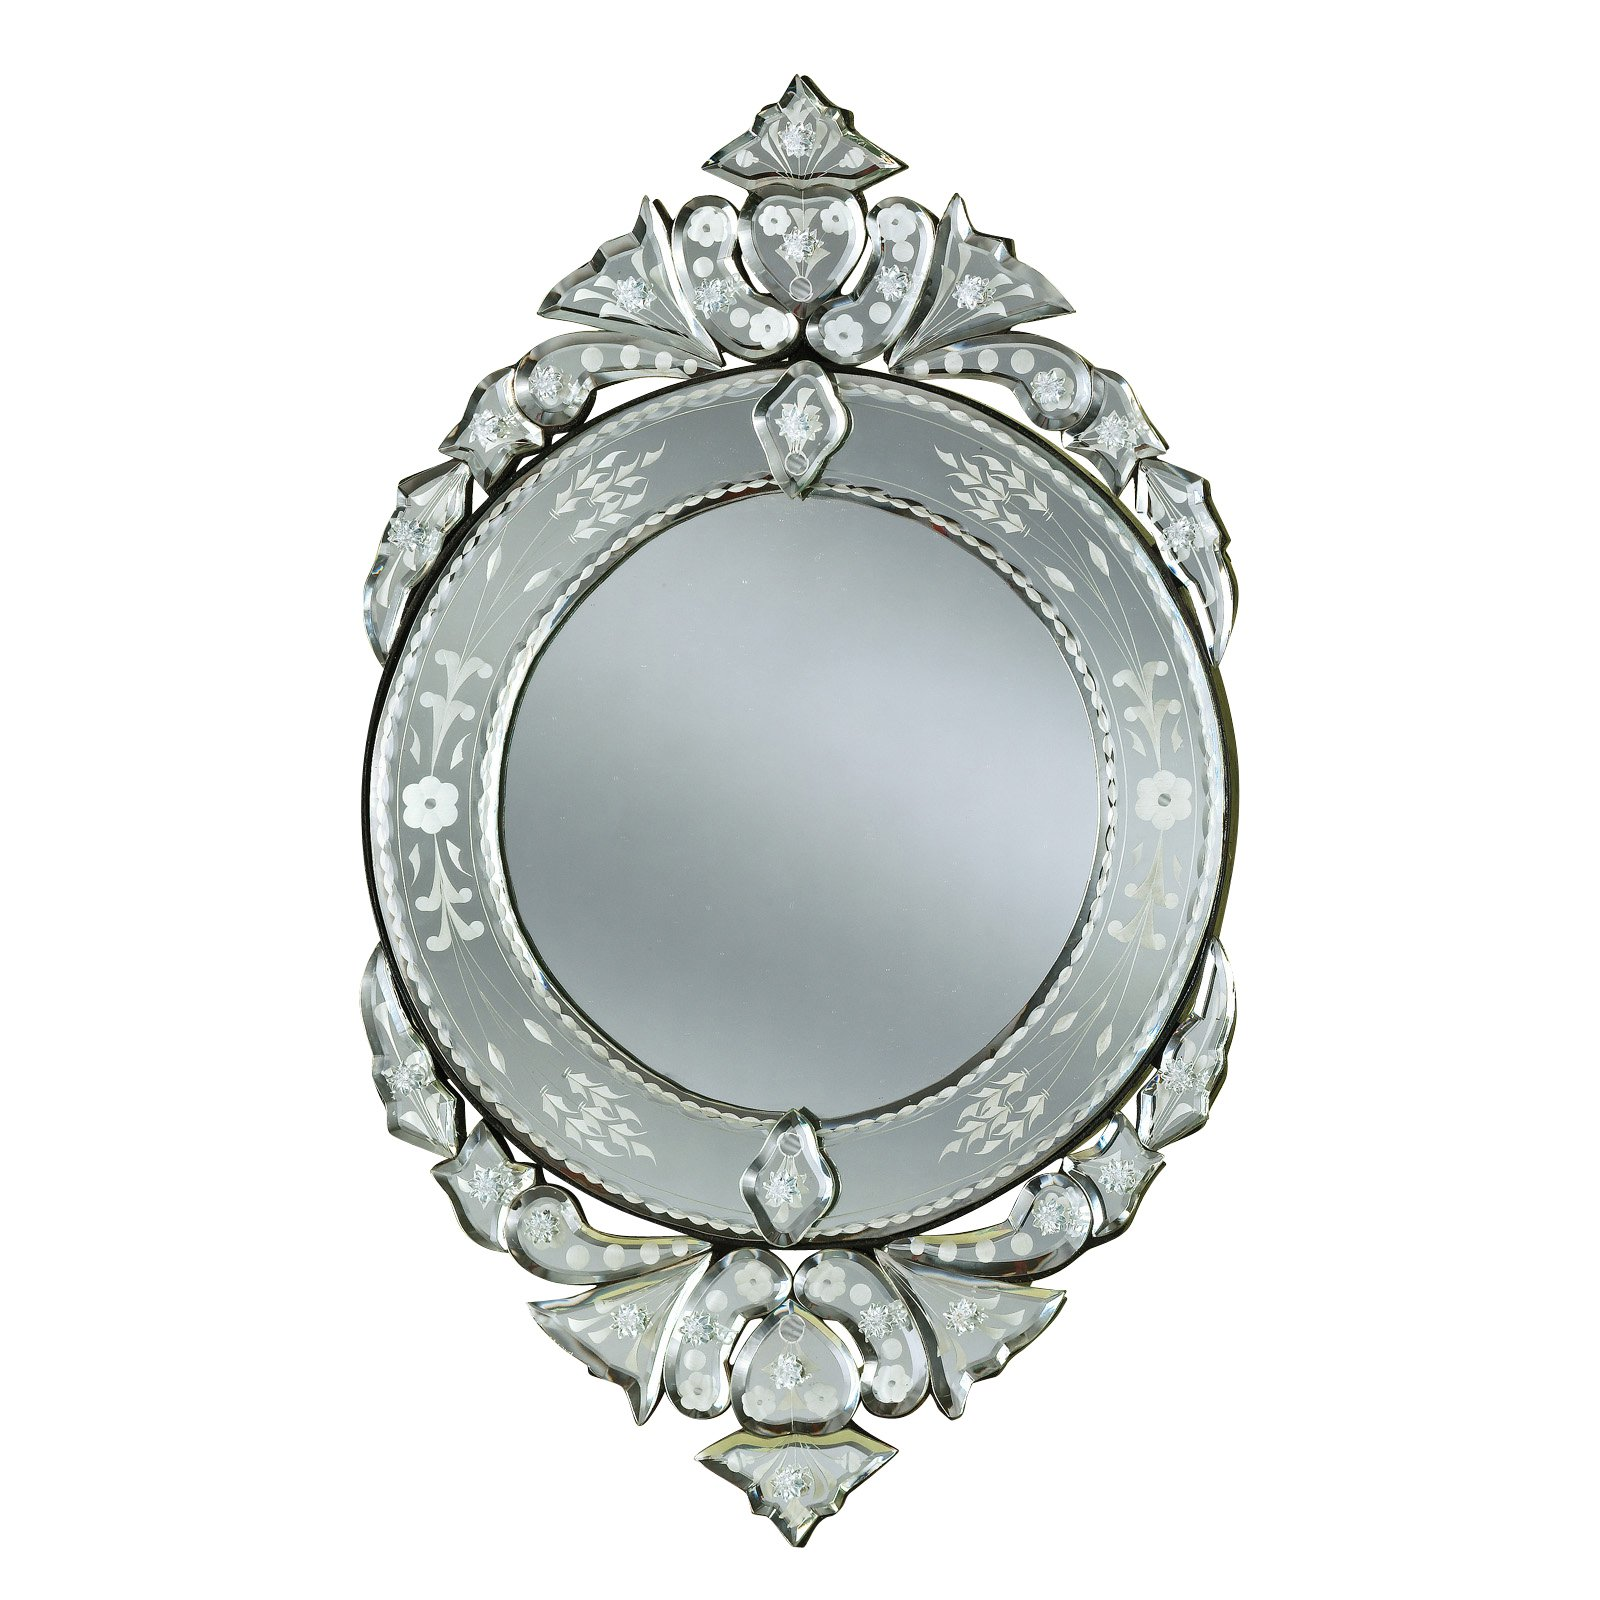 Mini Liro Venetian Arched Wall Mirror - 12W x 20H in.